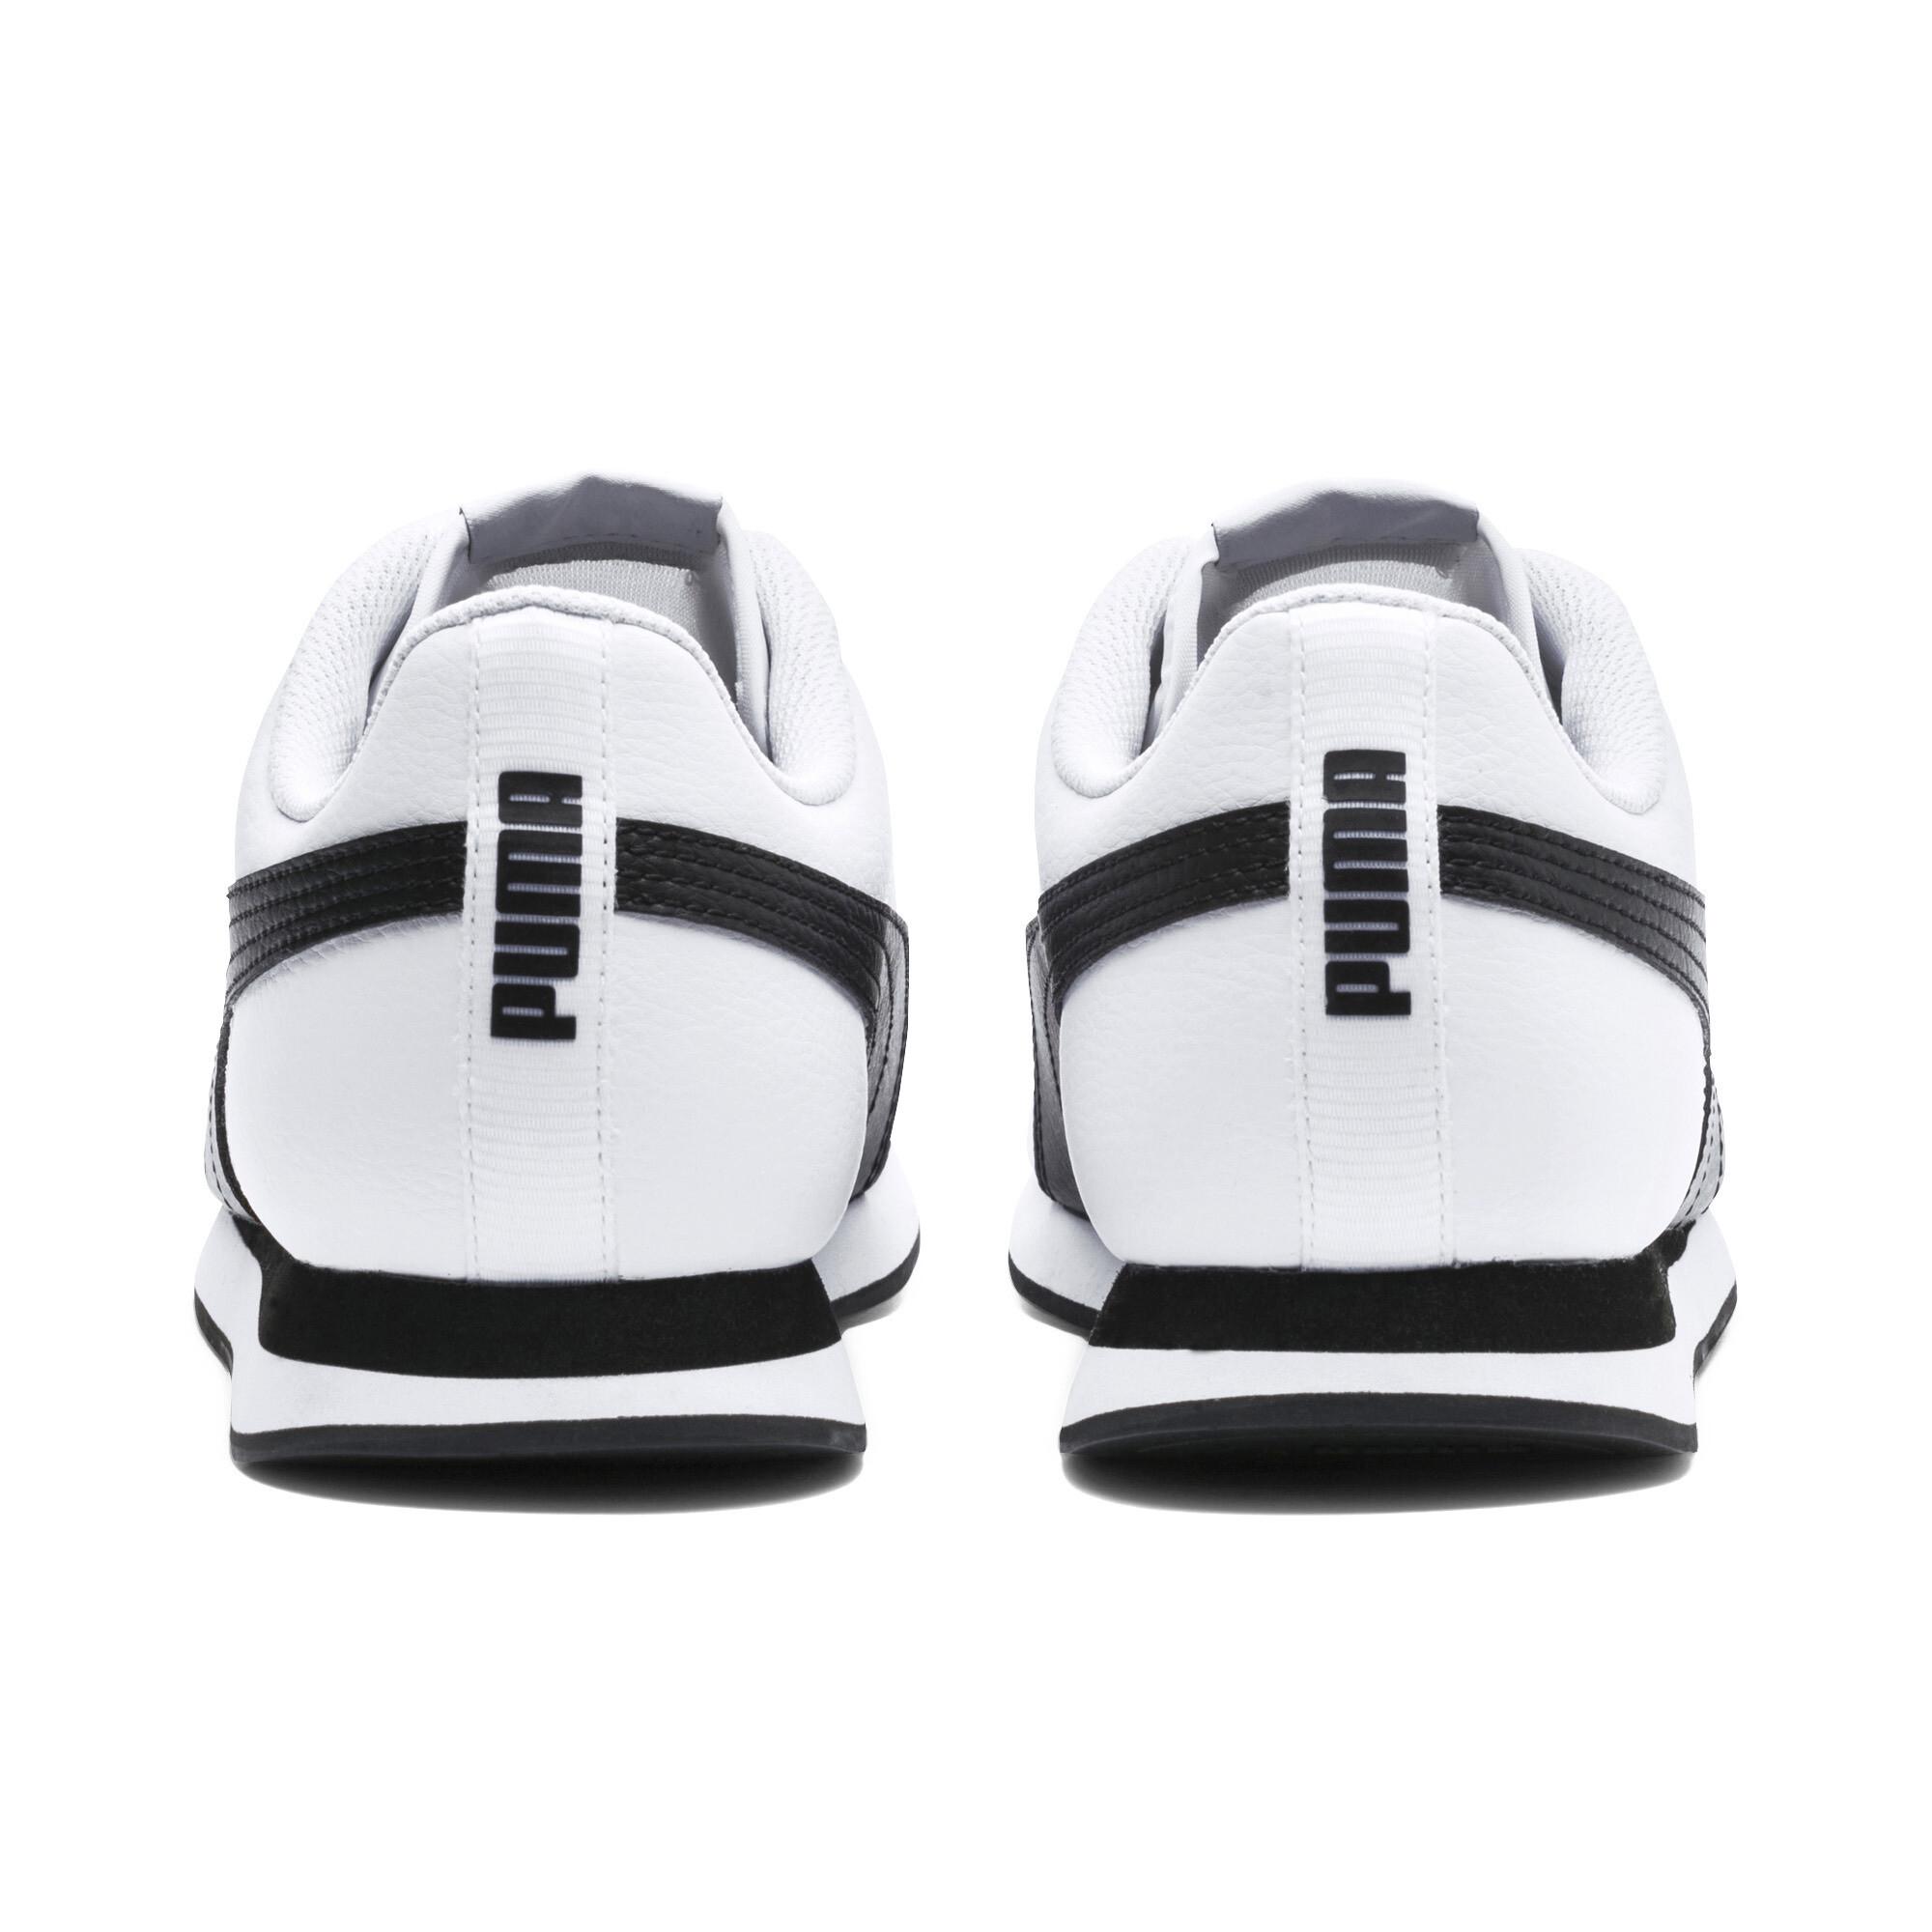 PUMA-Men-039-s-Turin-II-Sneakers thumbnail 15